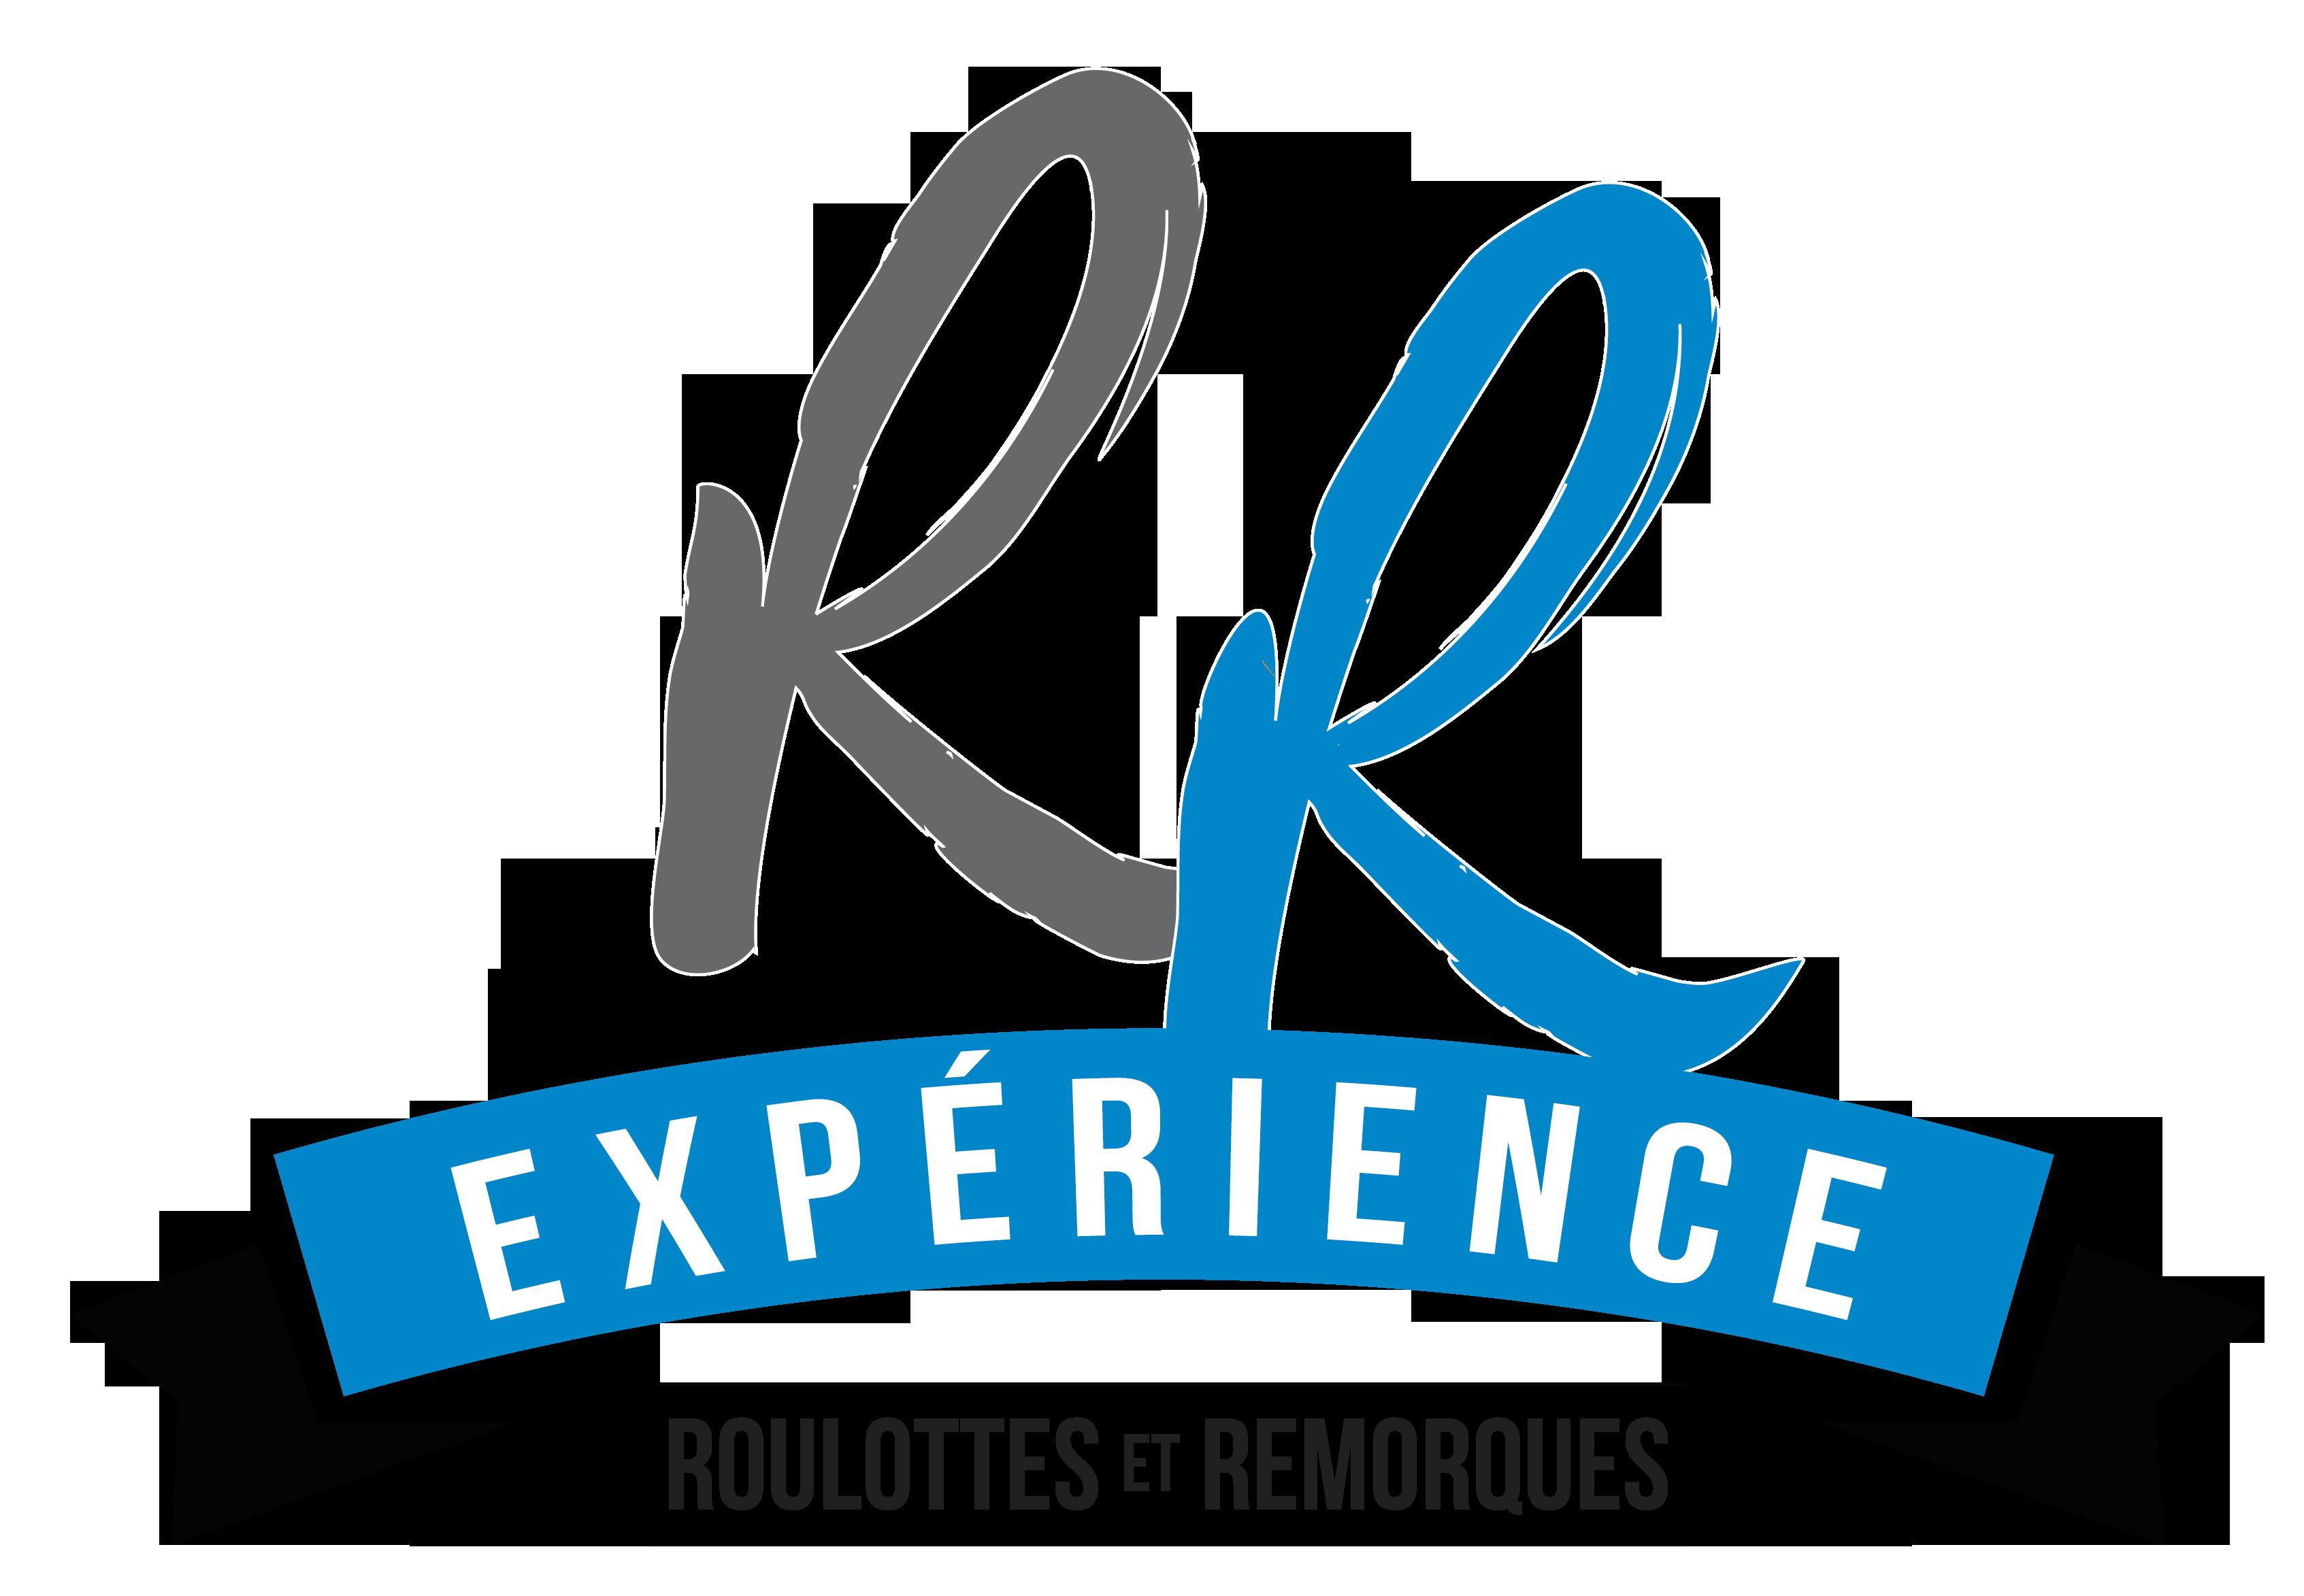 logo_RR_Experience_bleu